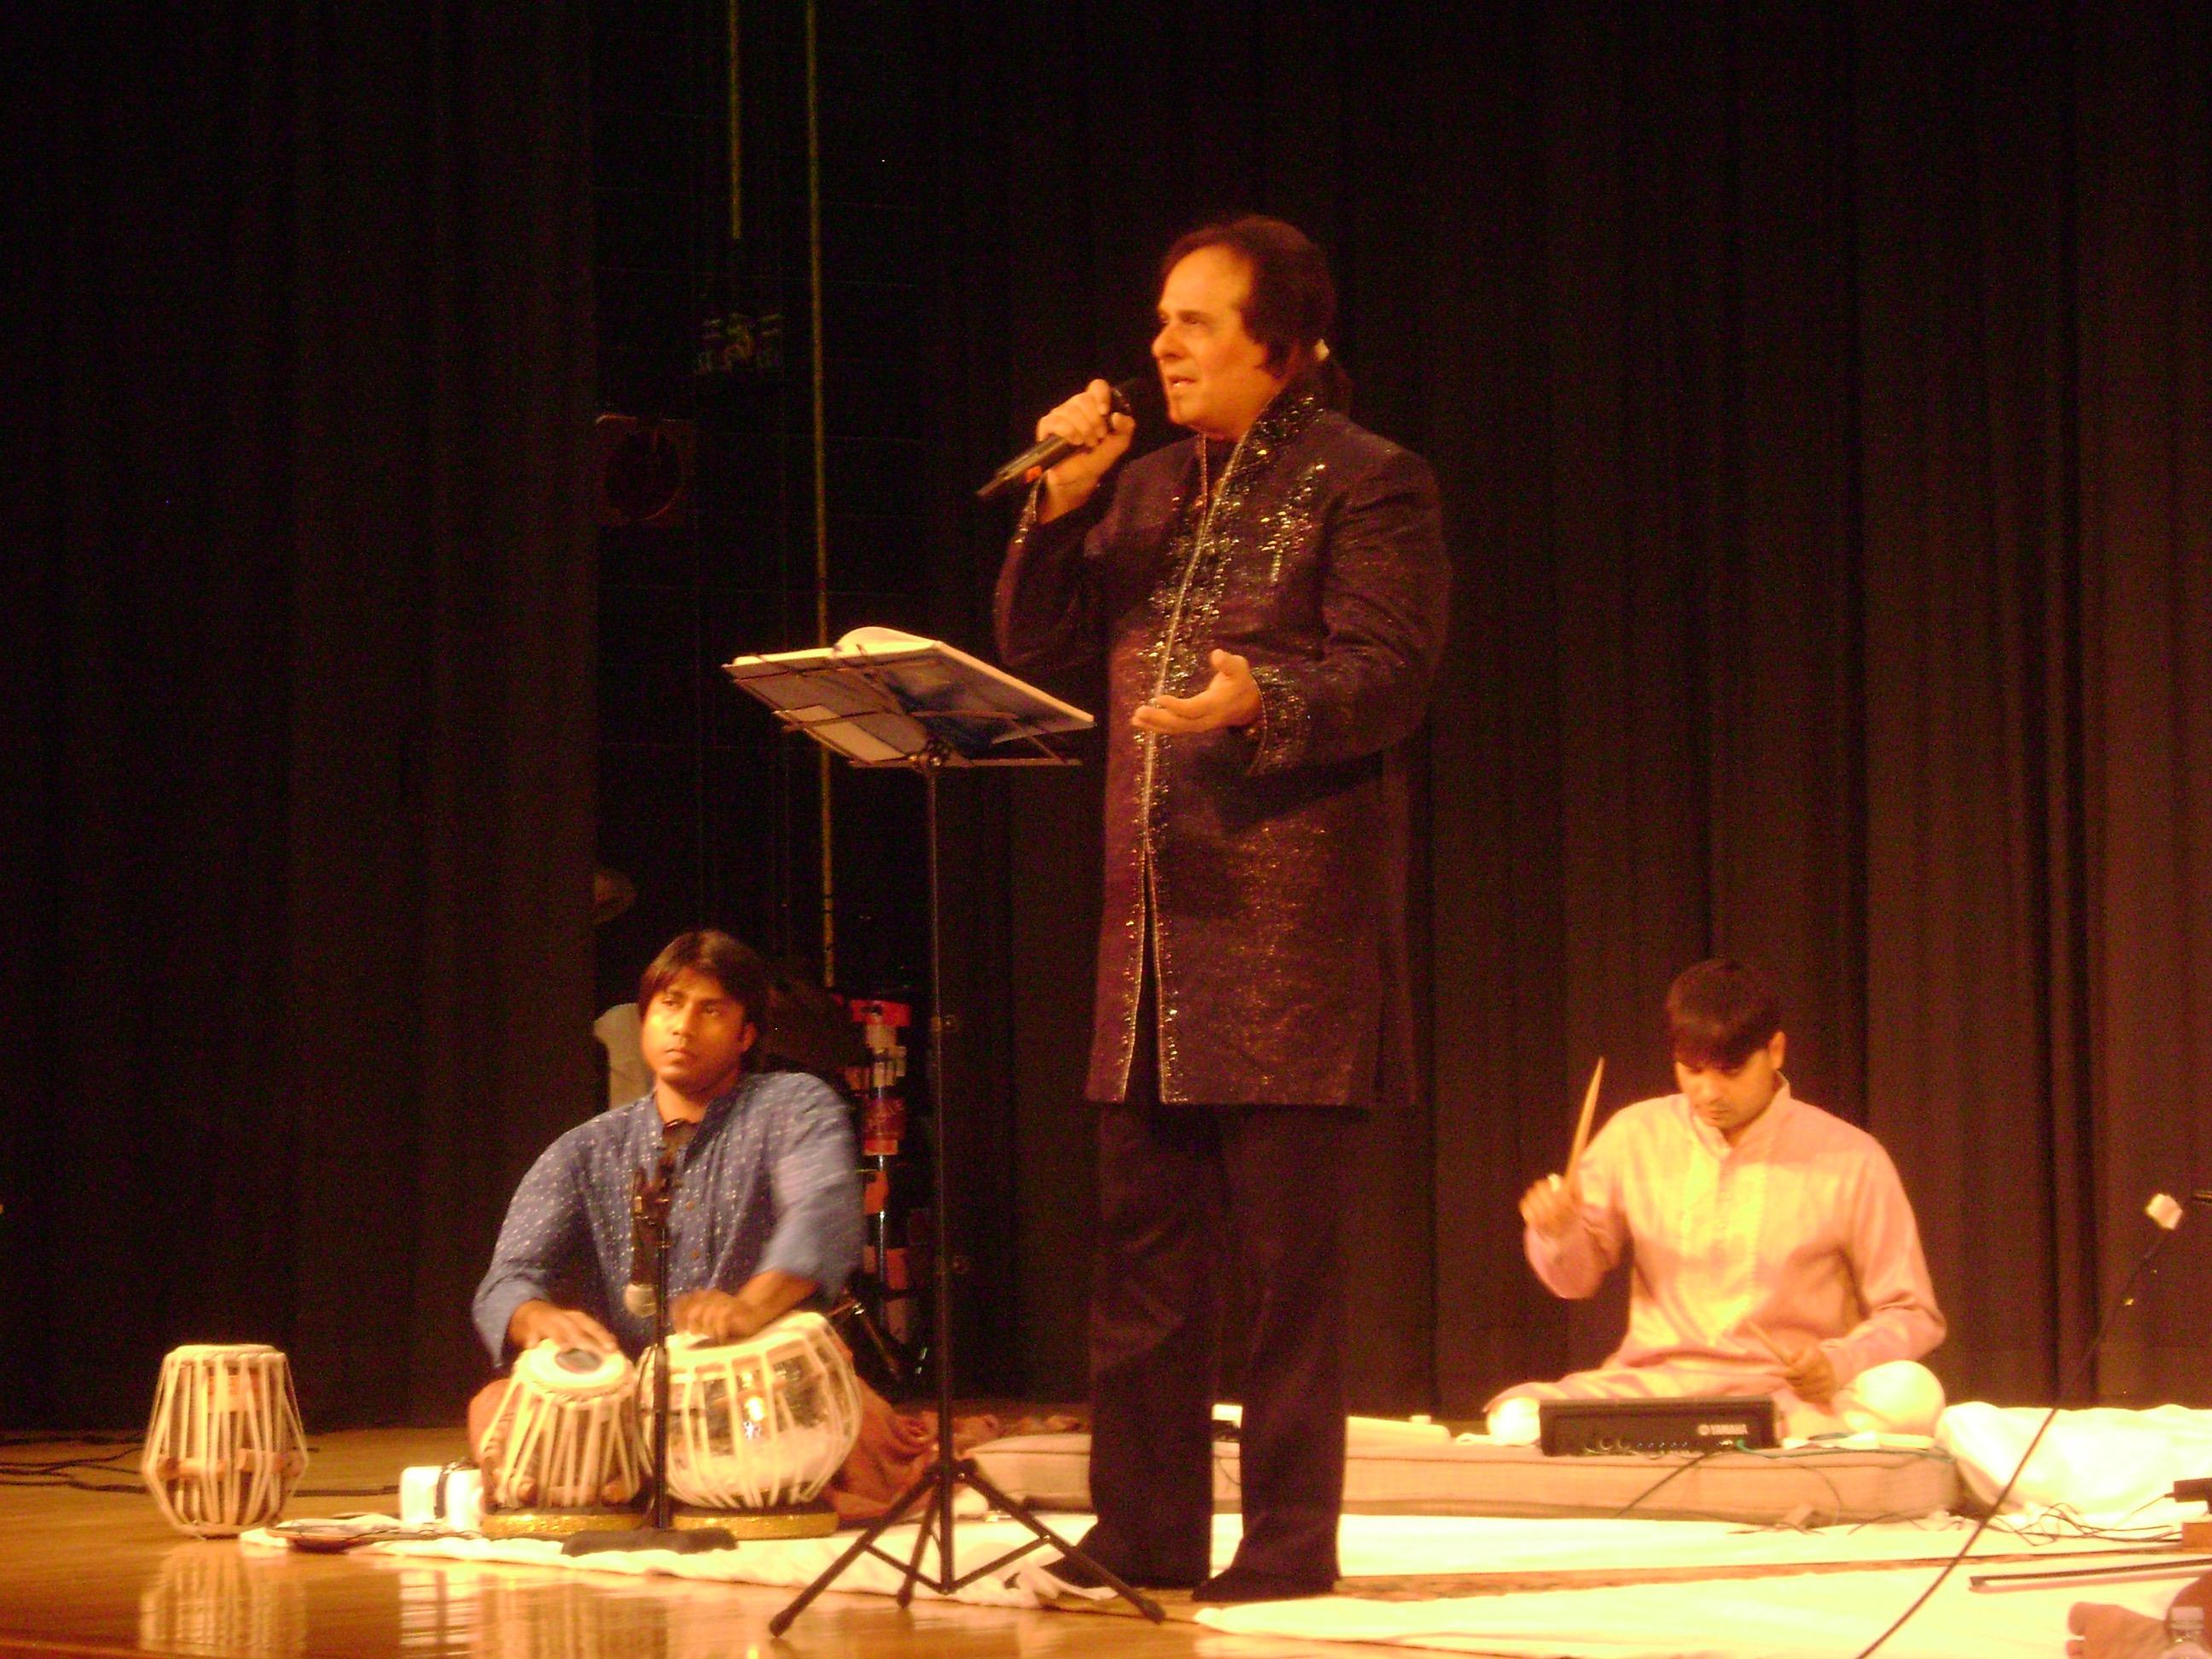 Anirban and Manhar Udhas